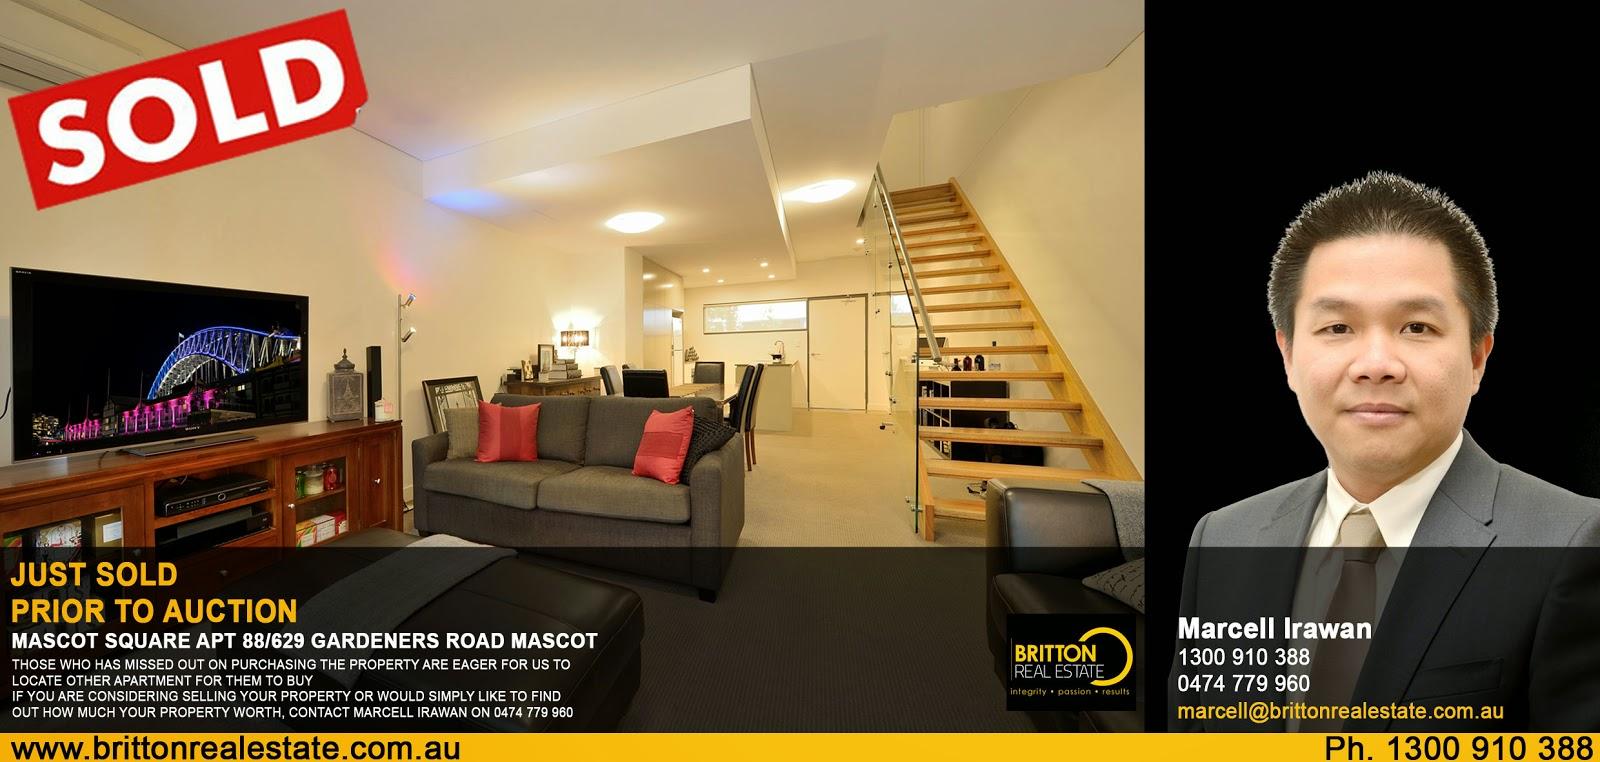 blackball design britton real estate flyer